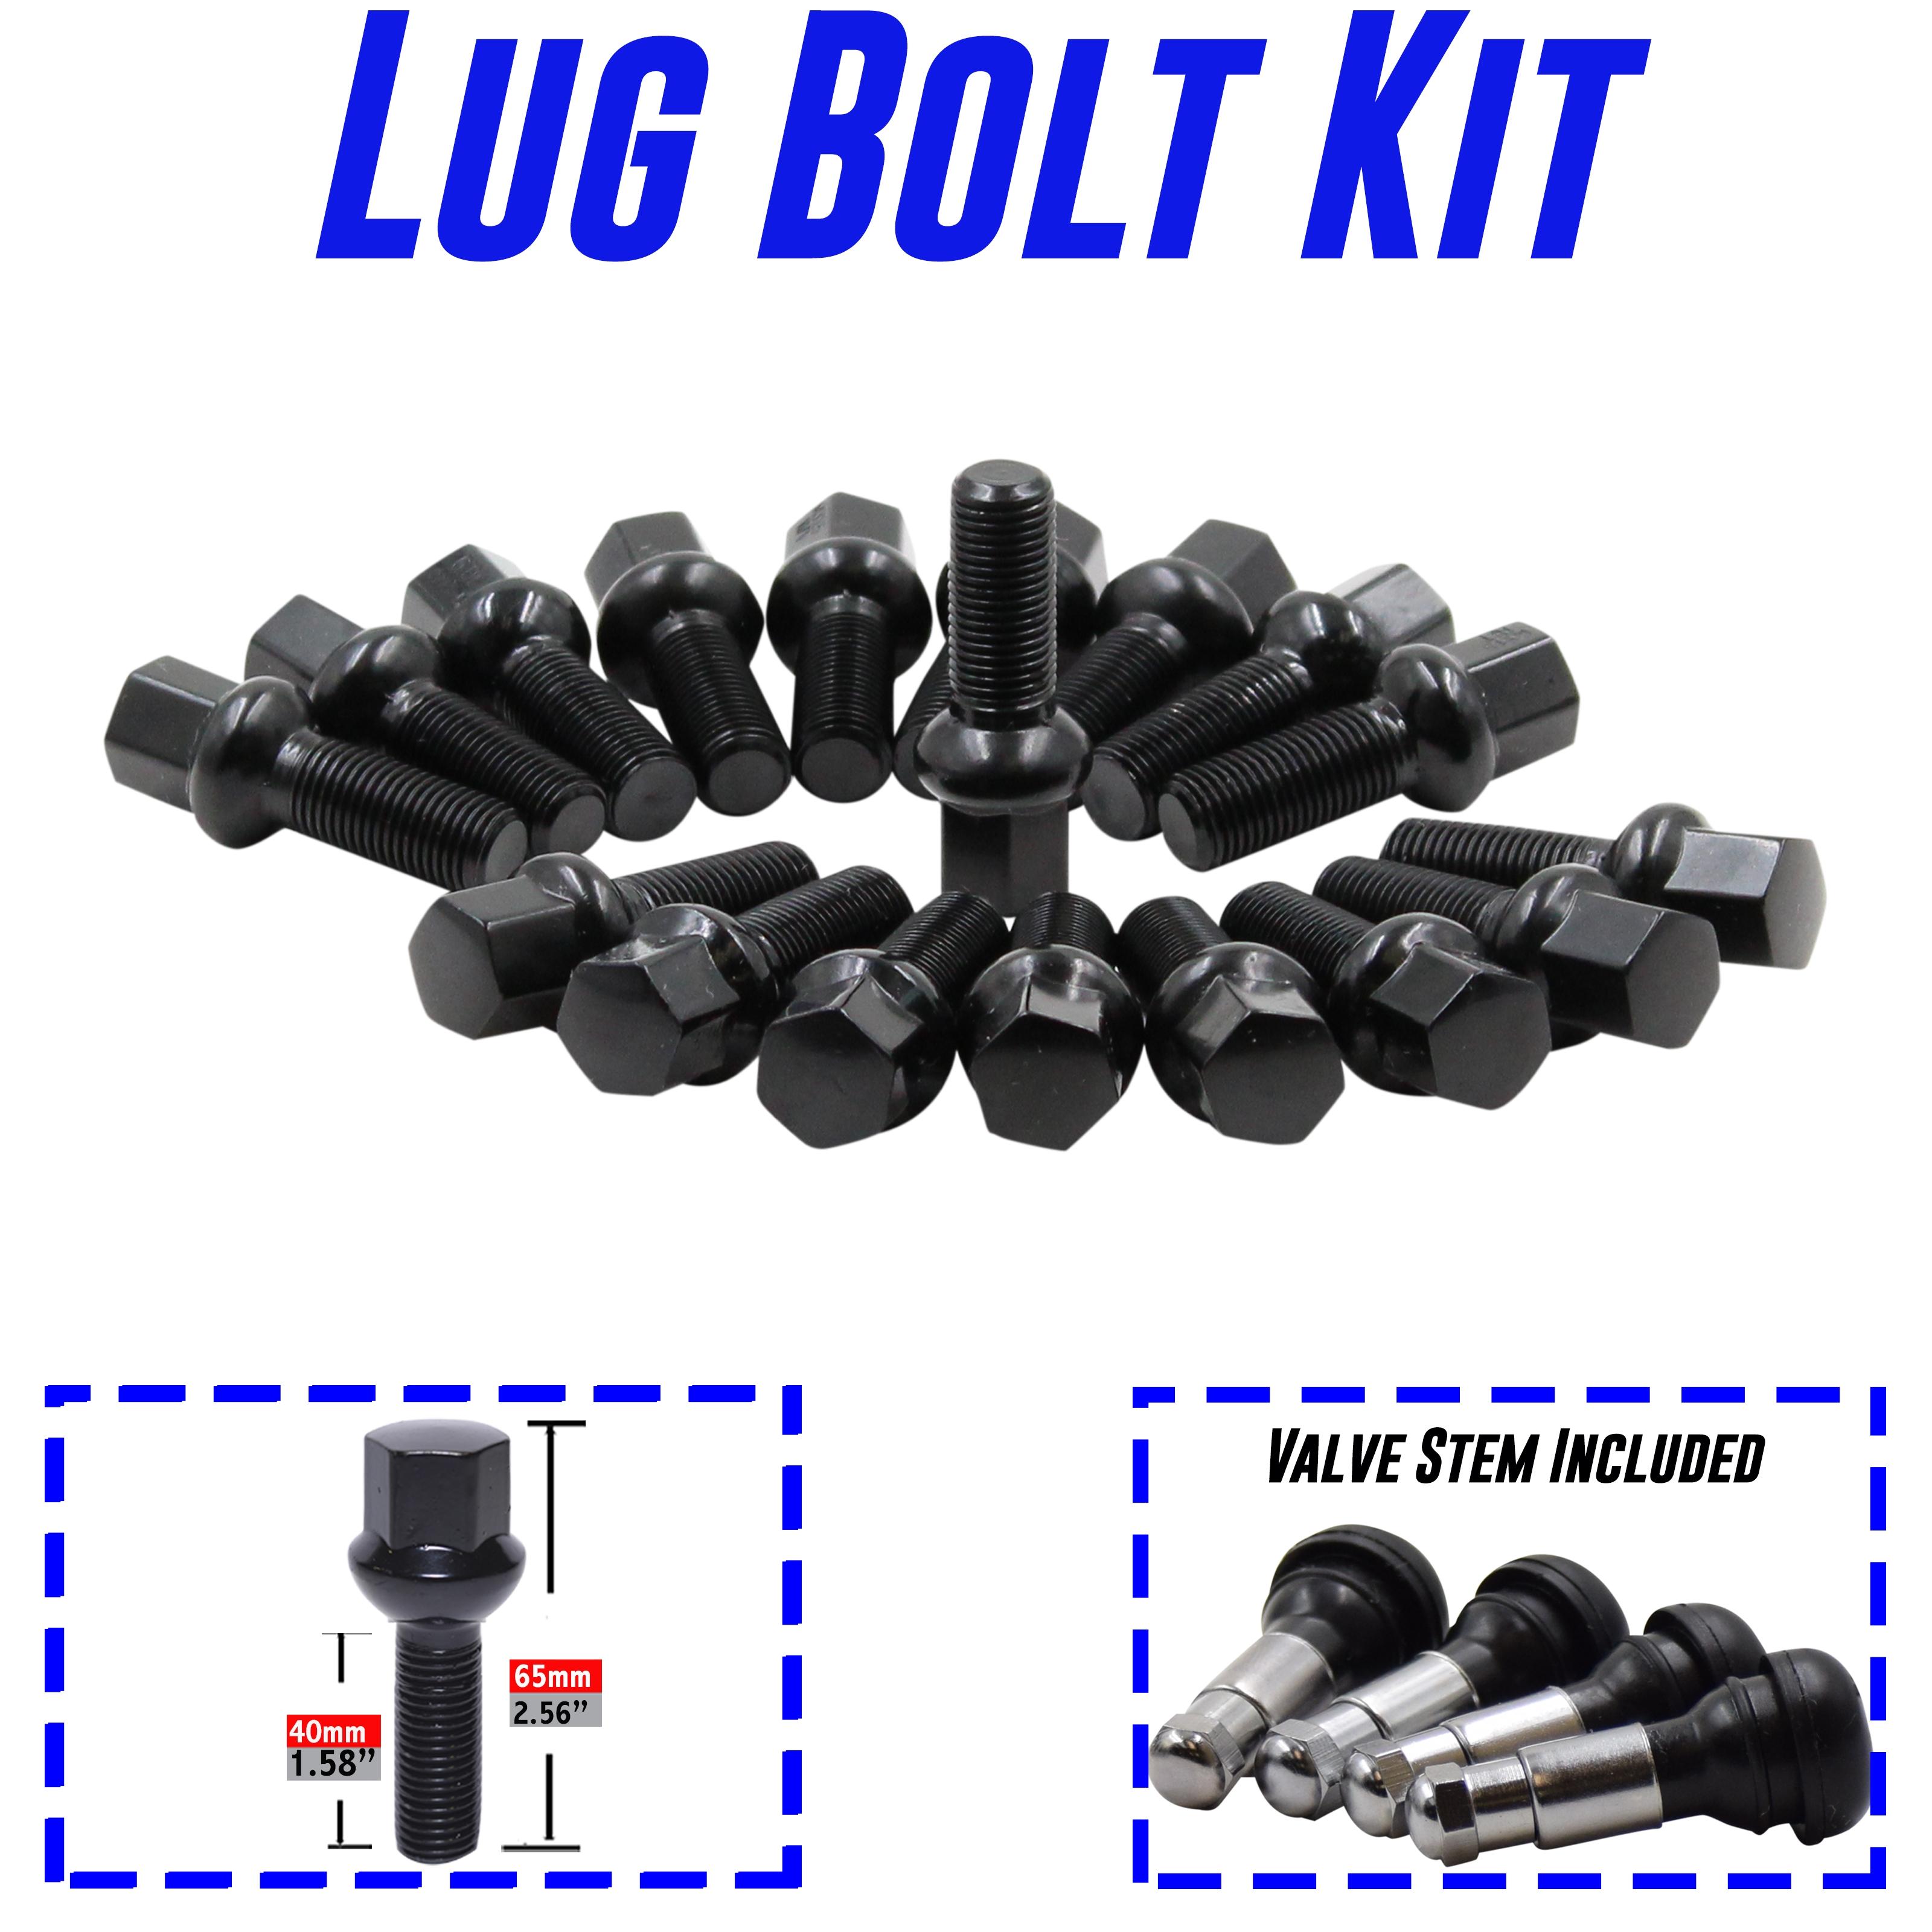 Ball Seat, 40mm Shank 10 - for many VW Audi Mercedes Black 14x1.5 Lug Bolts